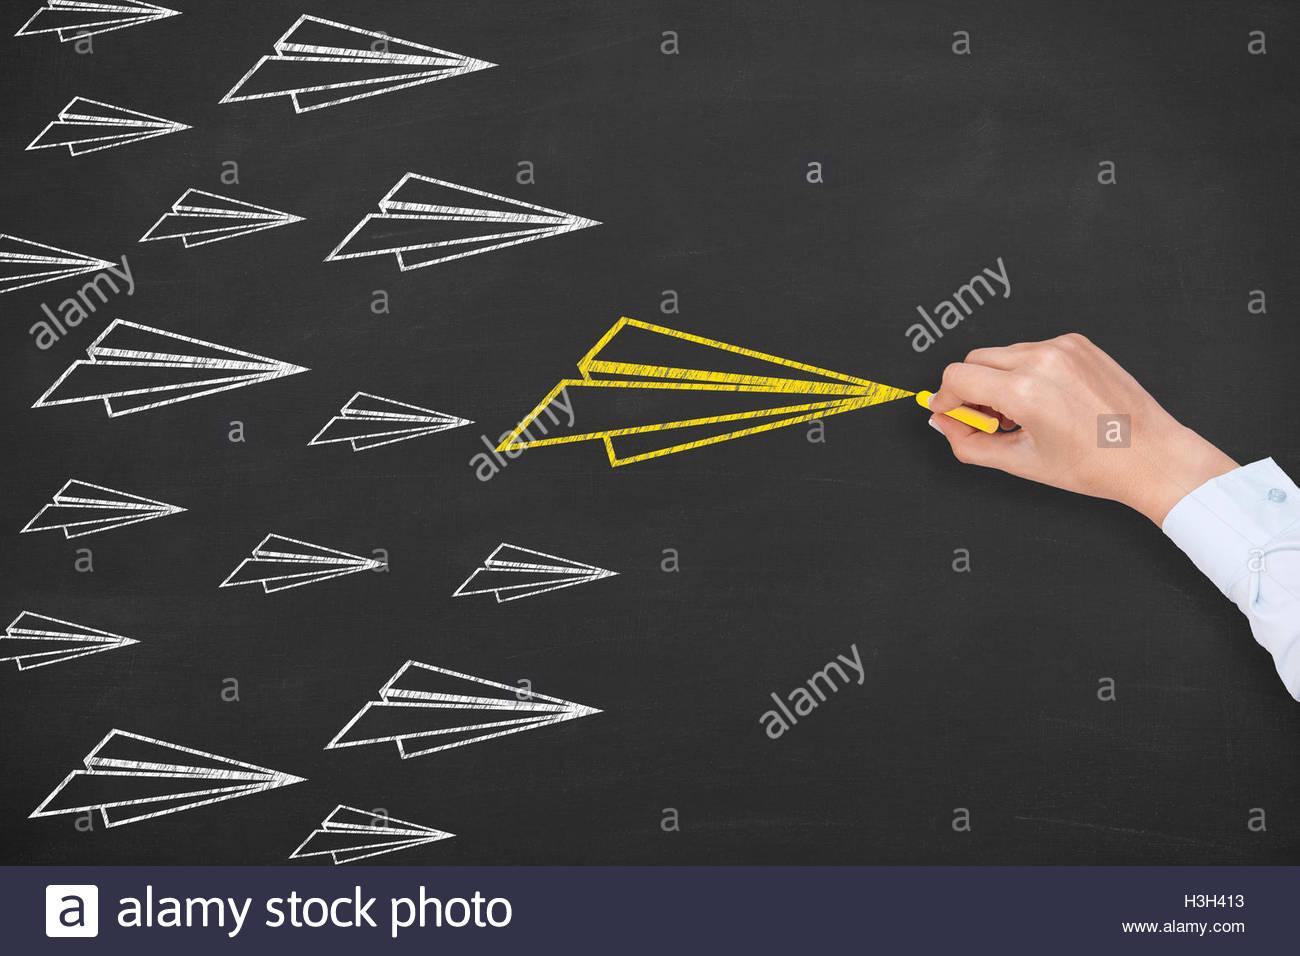 Airplane Leadership Concept on Chalkboard - Stock Image